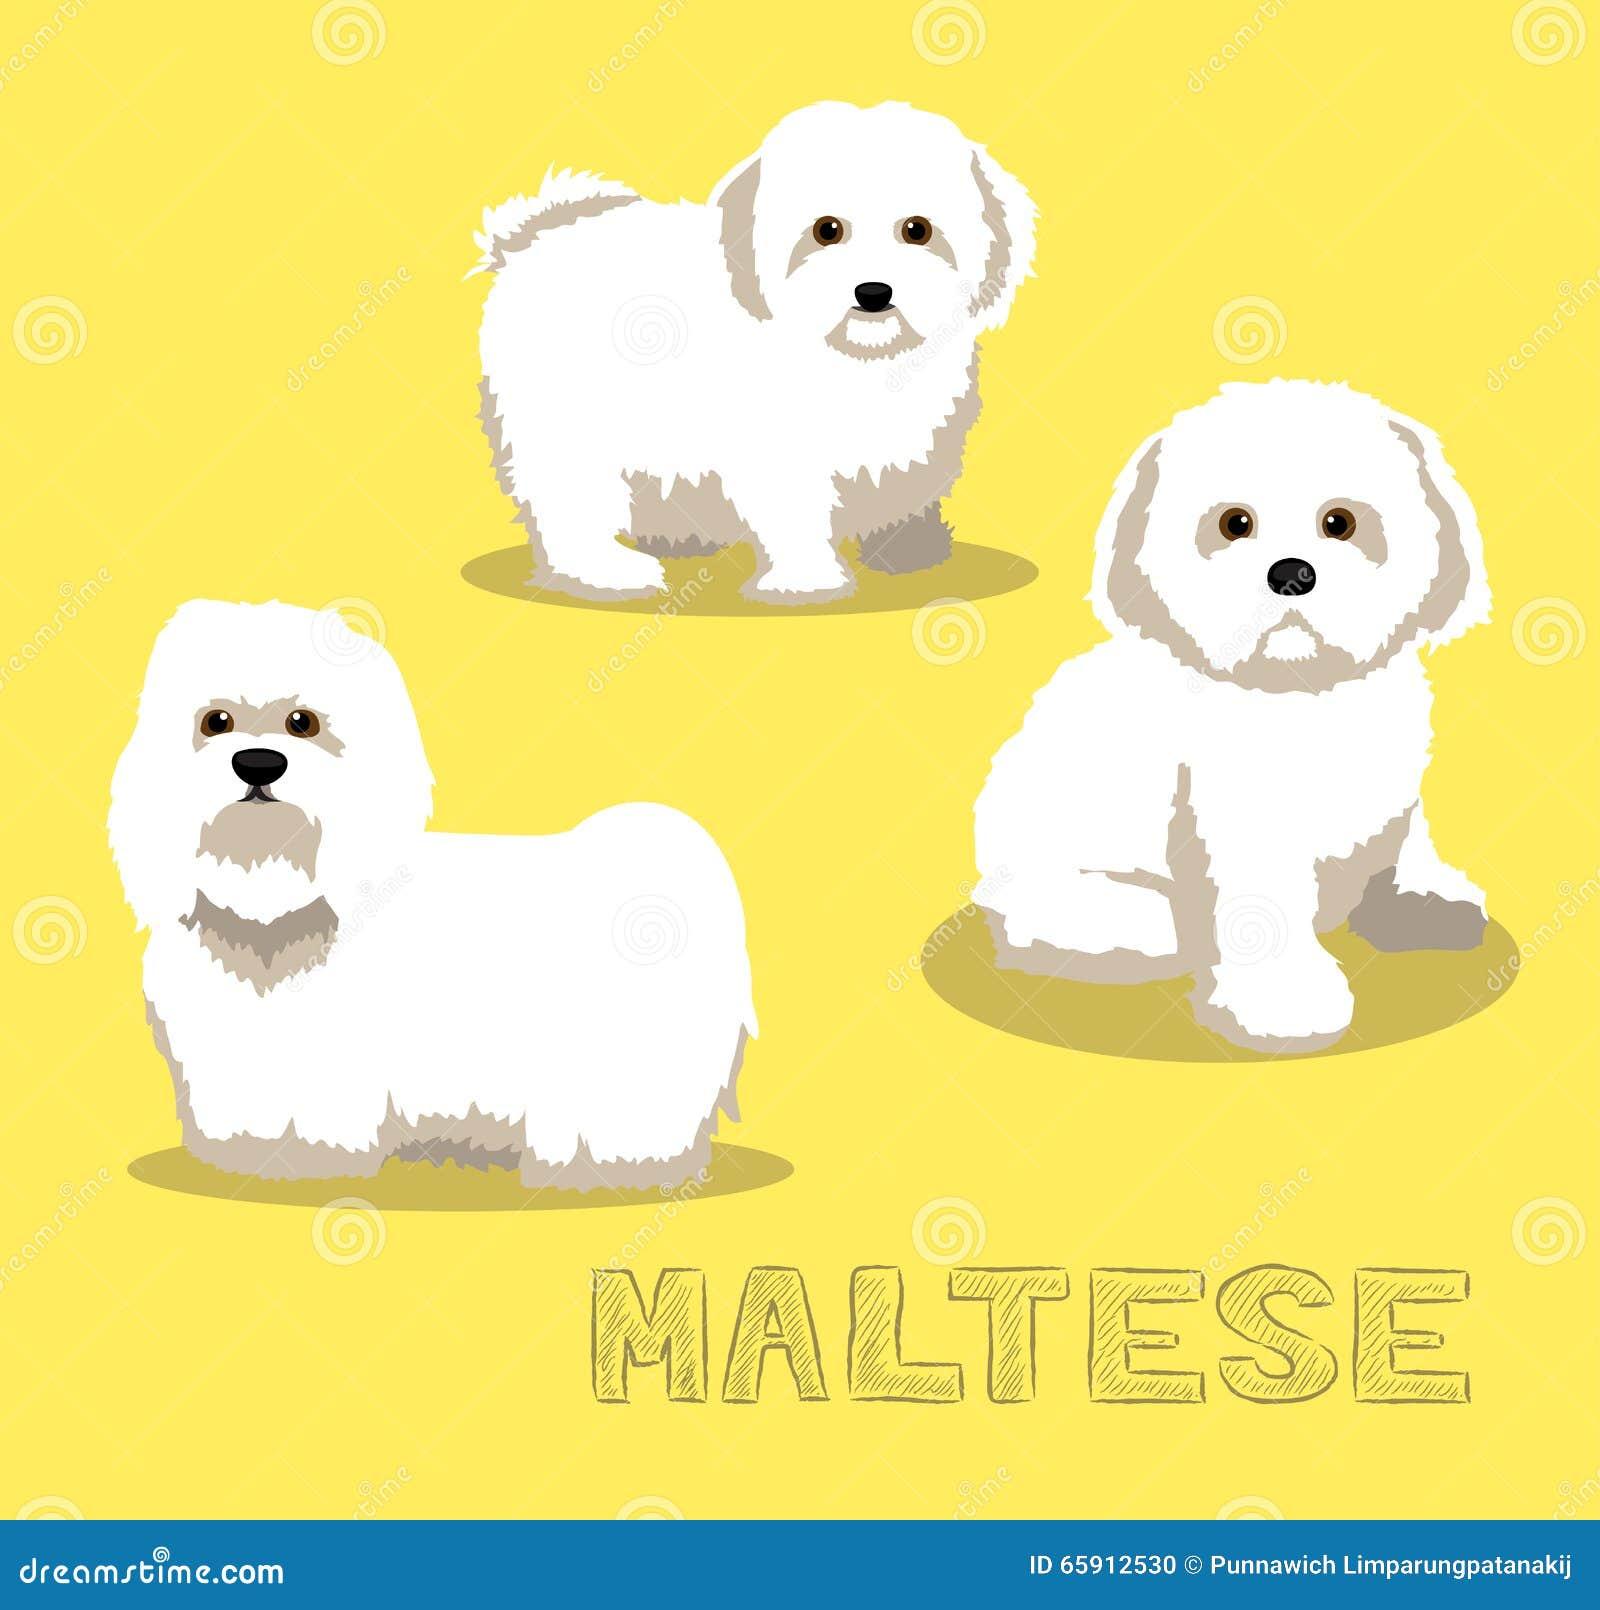 free clipart maltese dog - photo #35